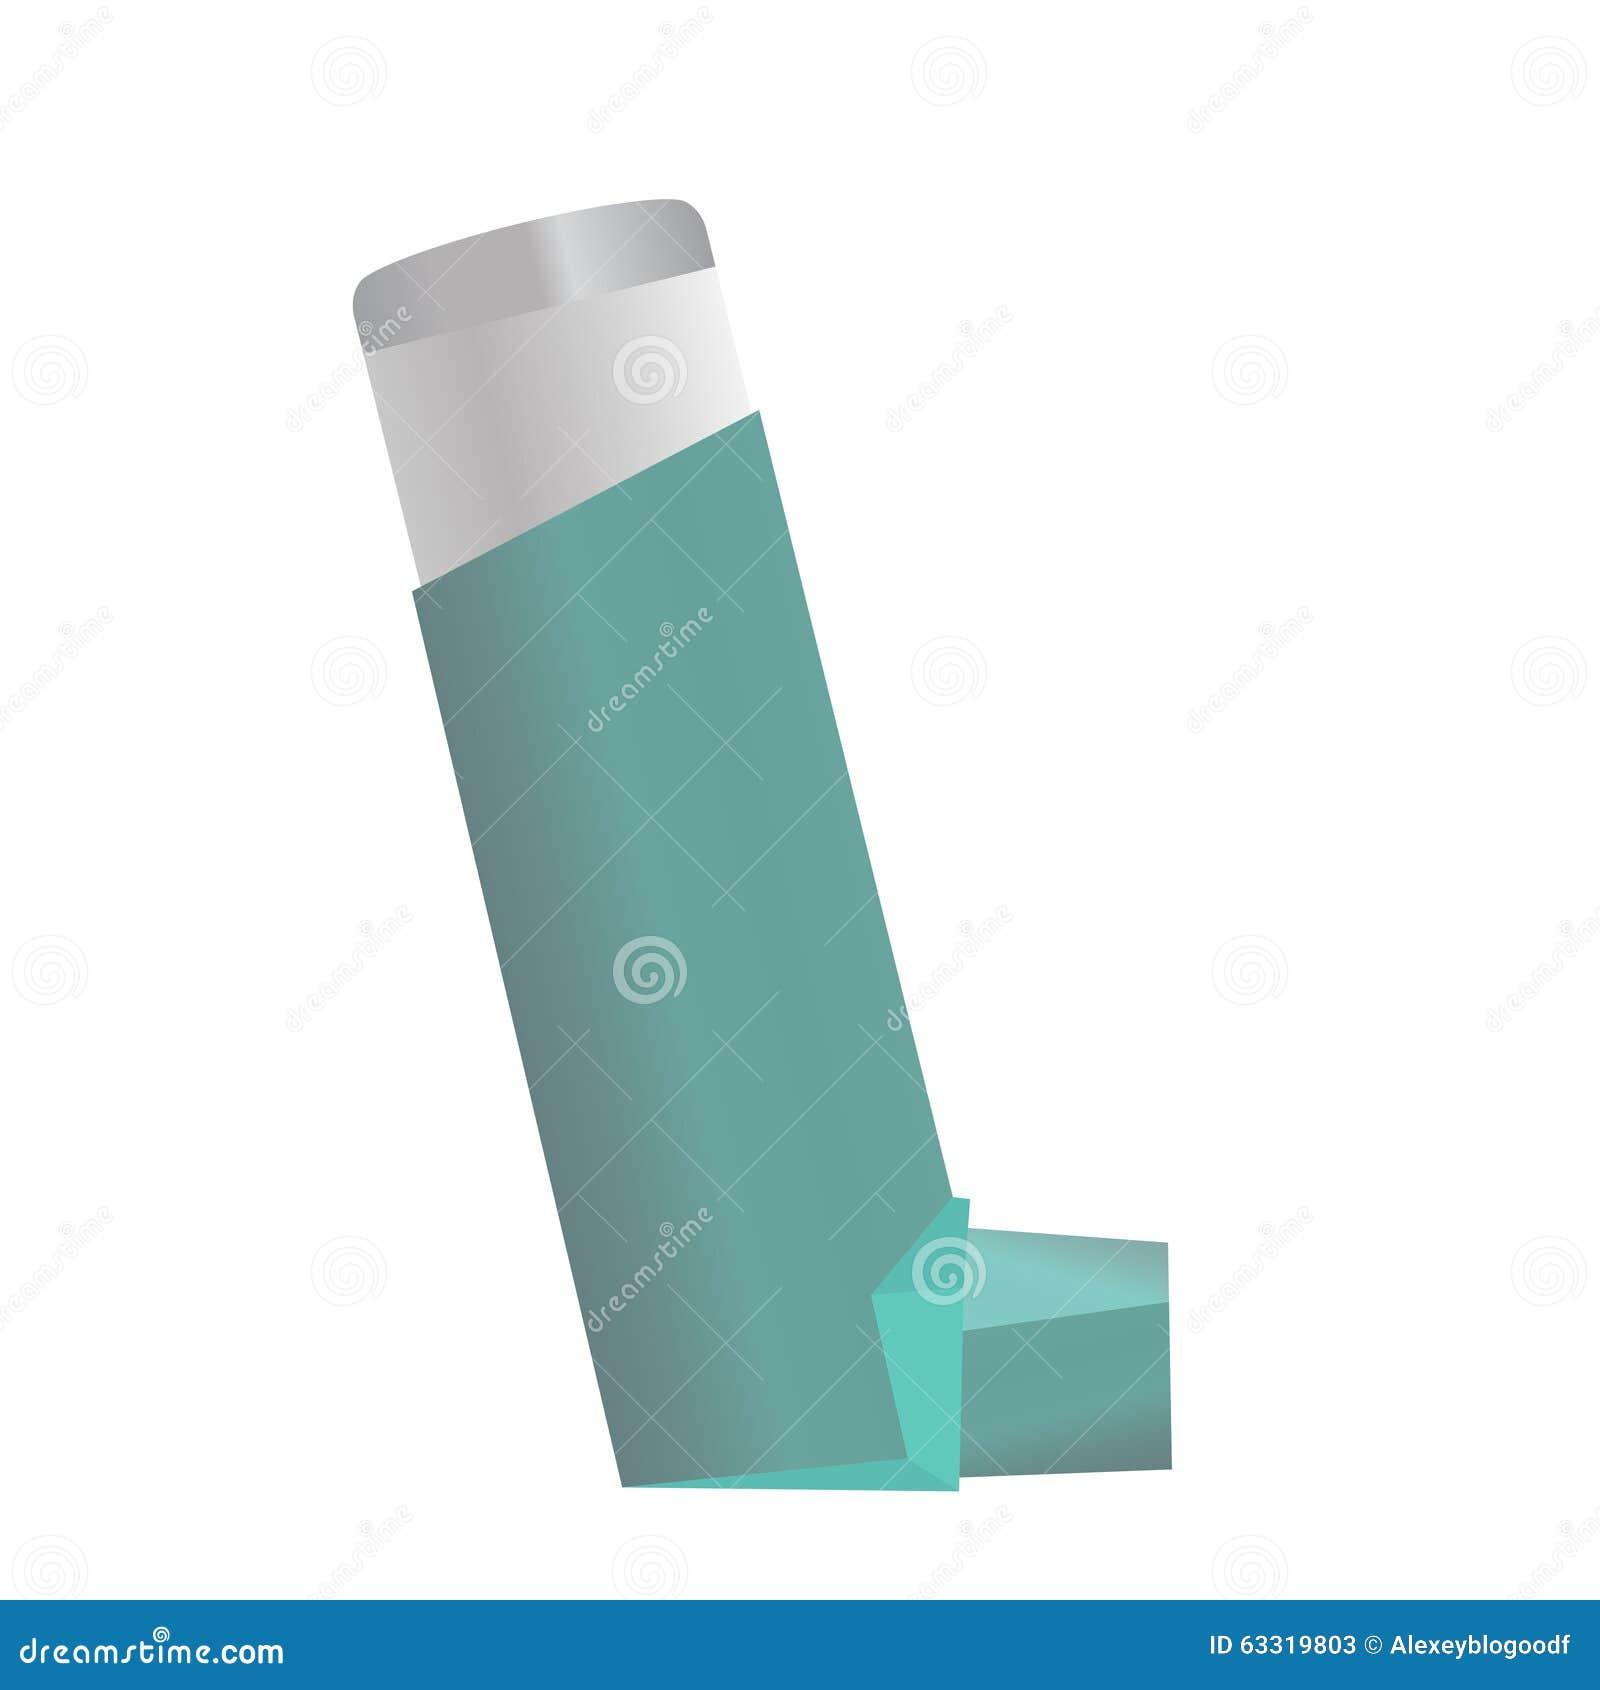 asthma a respiratory disease essay Respiratory disease paper tara vaughns hcs 245 september 15, 2014 frances keeler respiratory disease paper asthma asthma is a chronic disease that attacks.